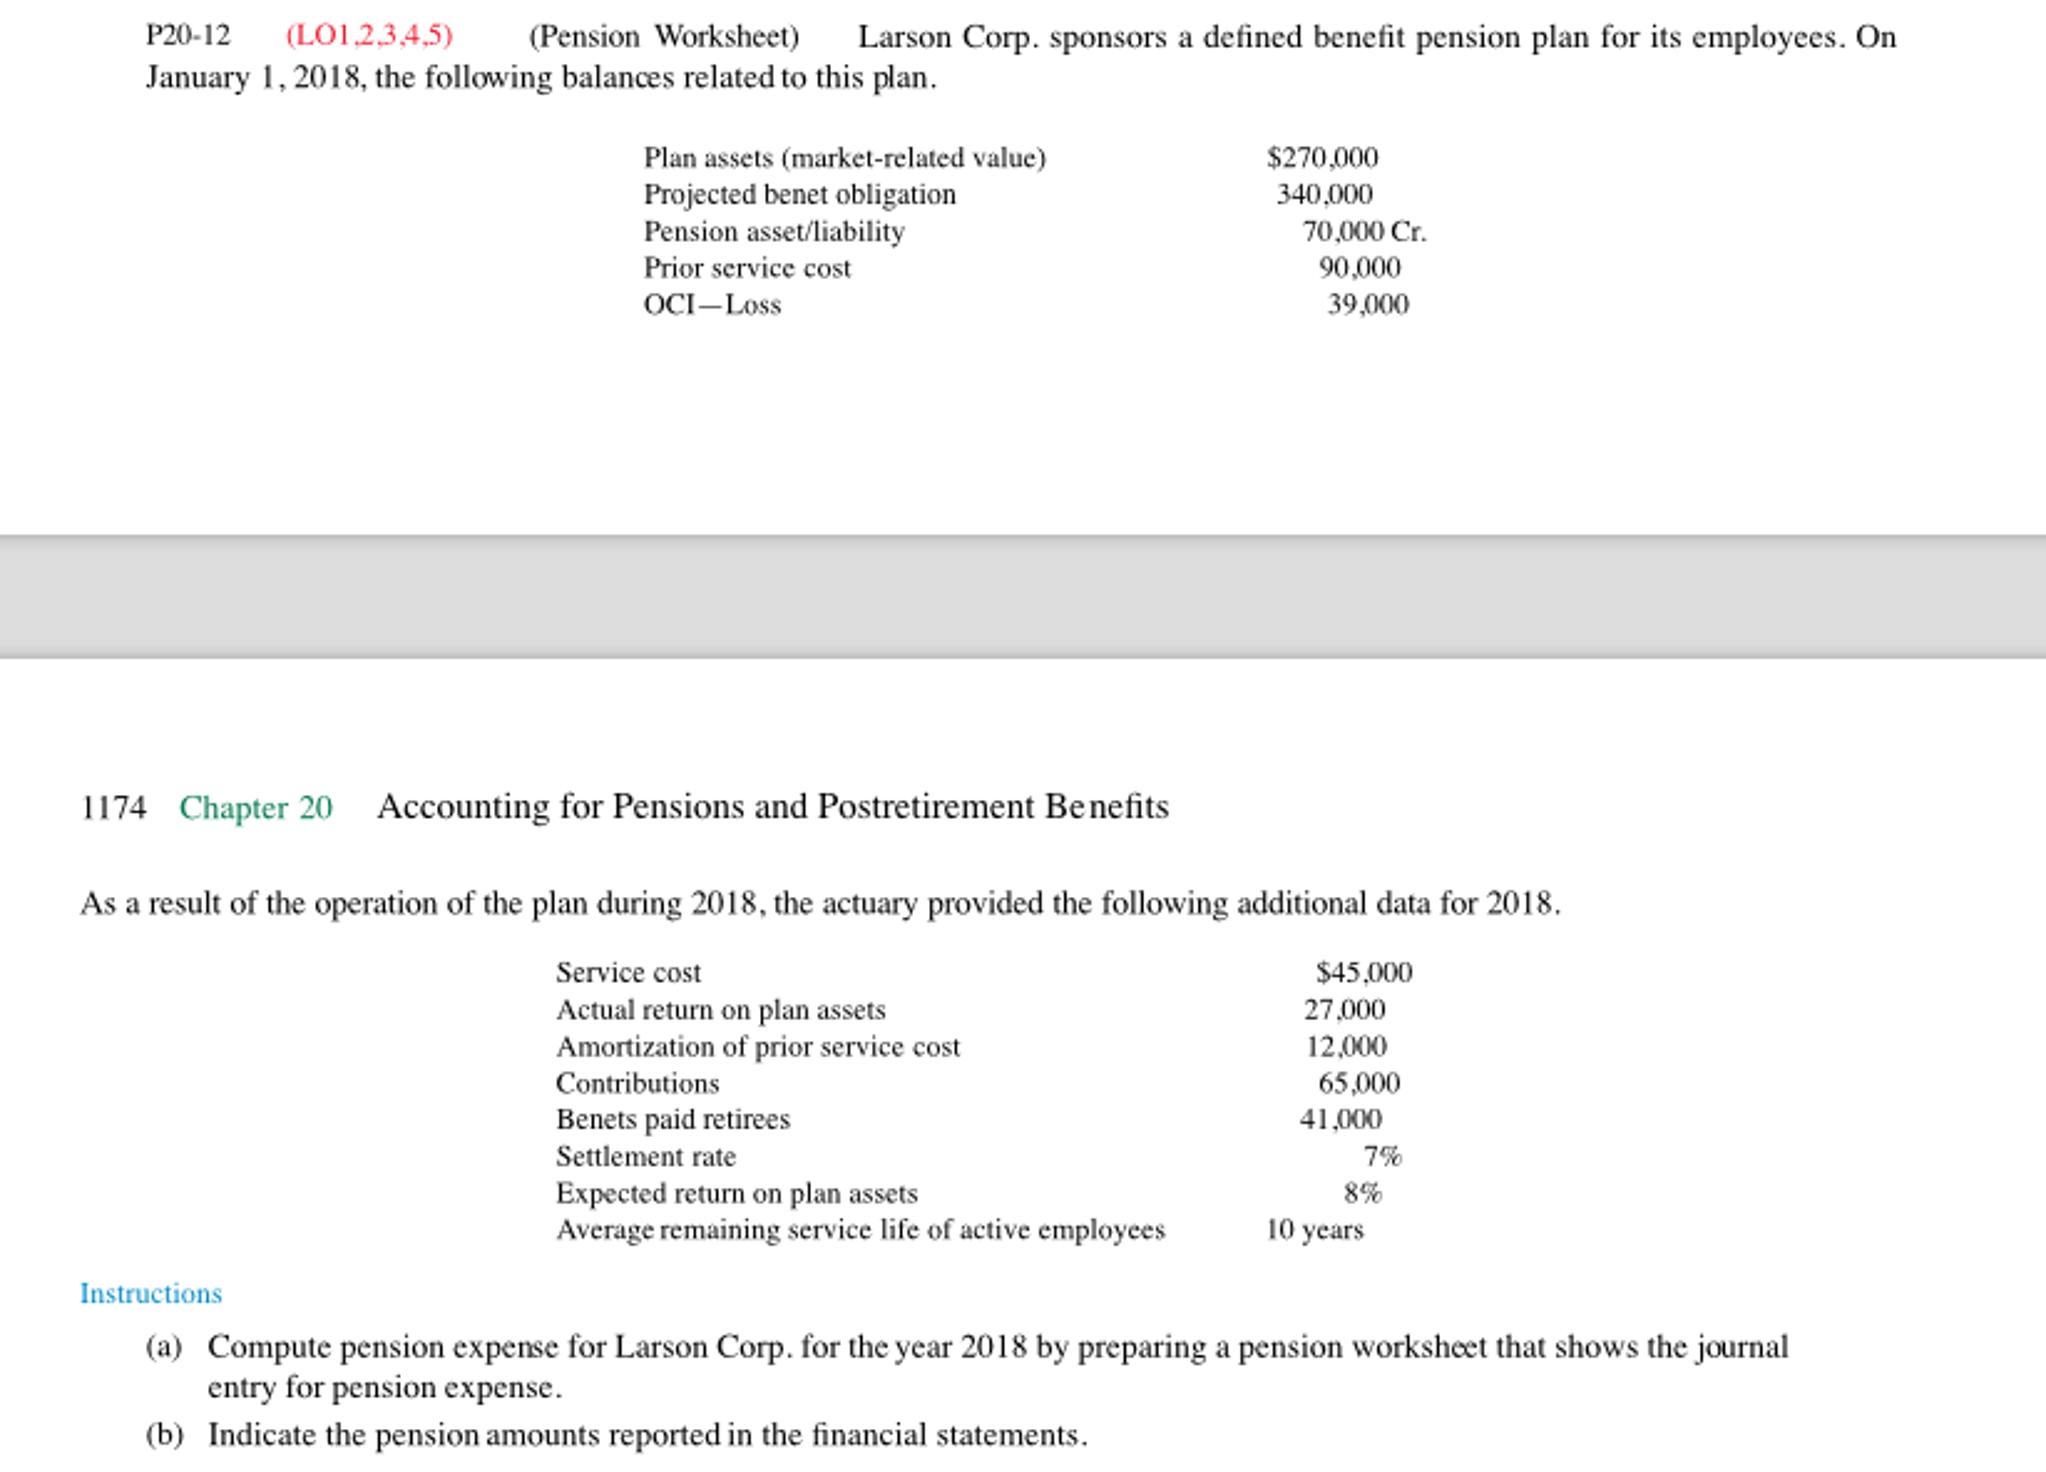 Larson Corp Sponsors A Defined Benefit Pension Pl – Pension Worksheet